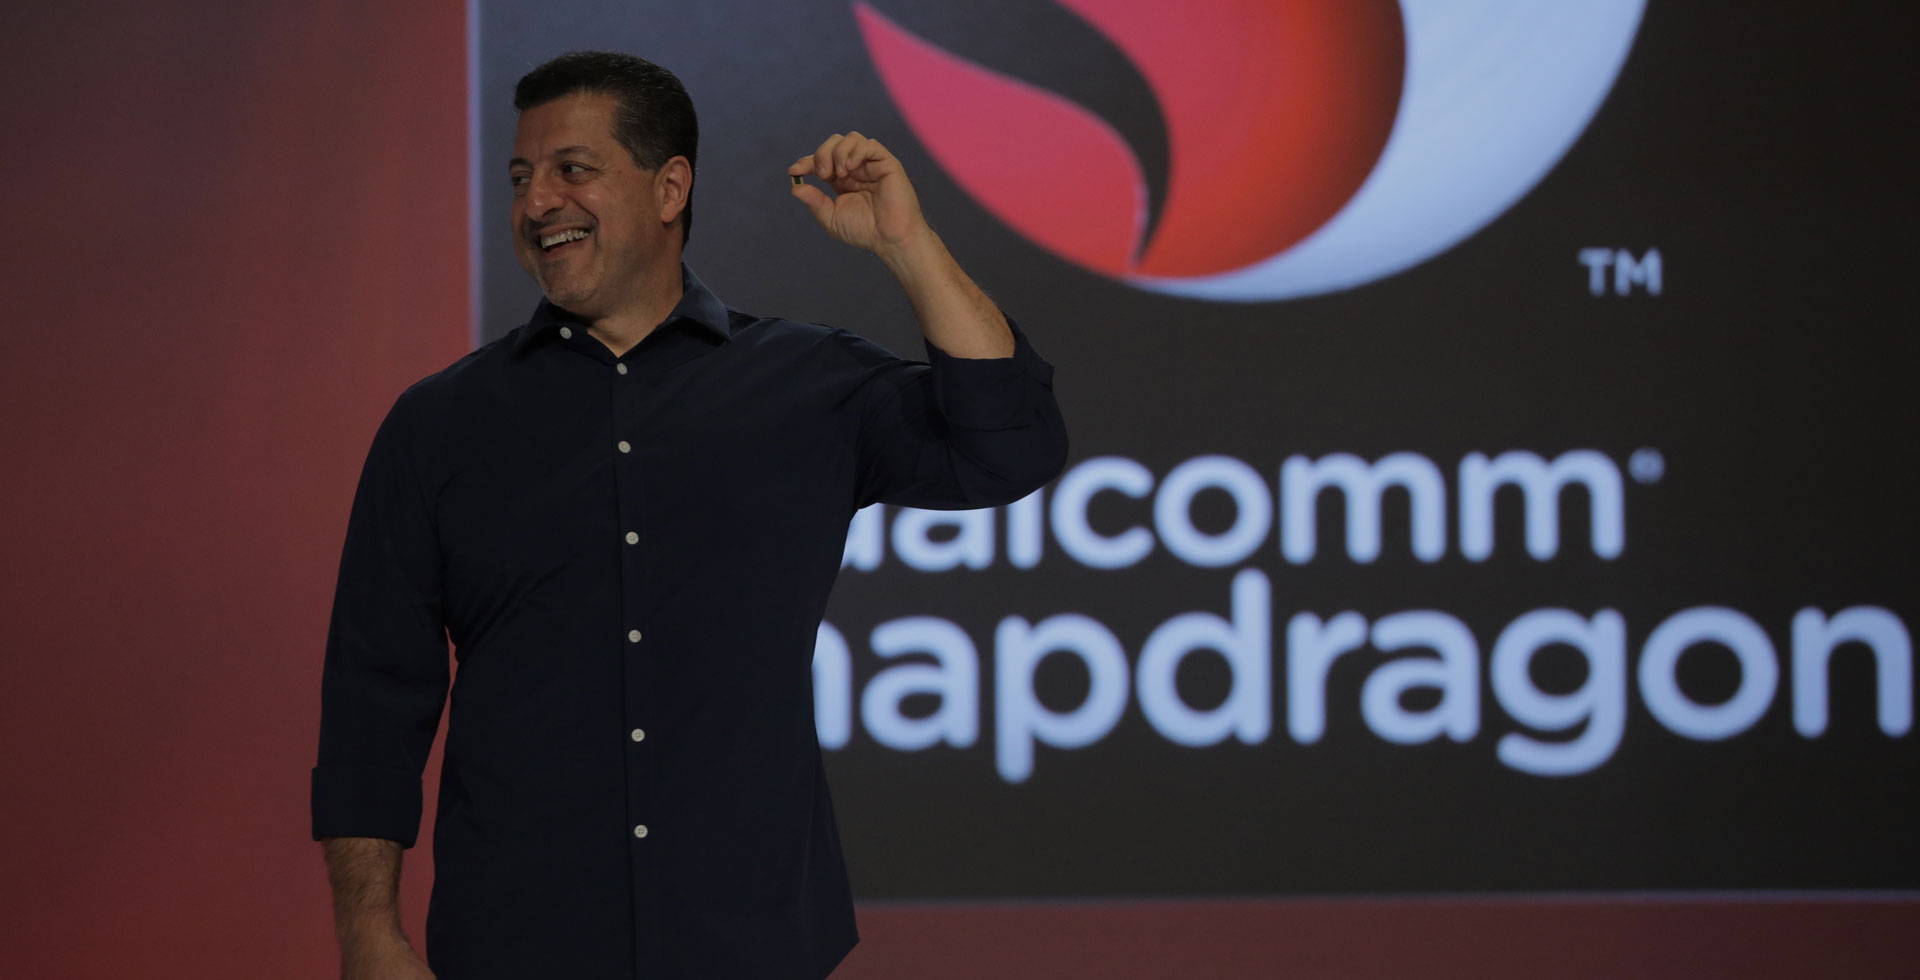 Qualcomm promises big FY19 profits if shareholders block Broadcom